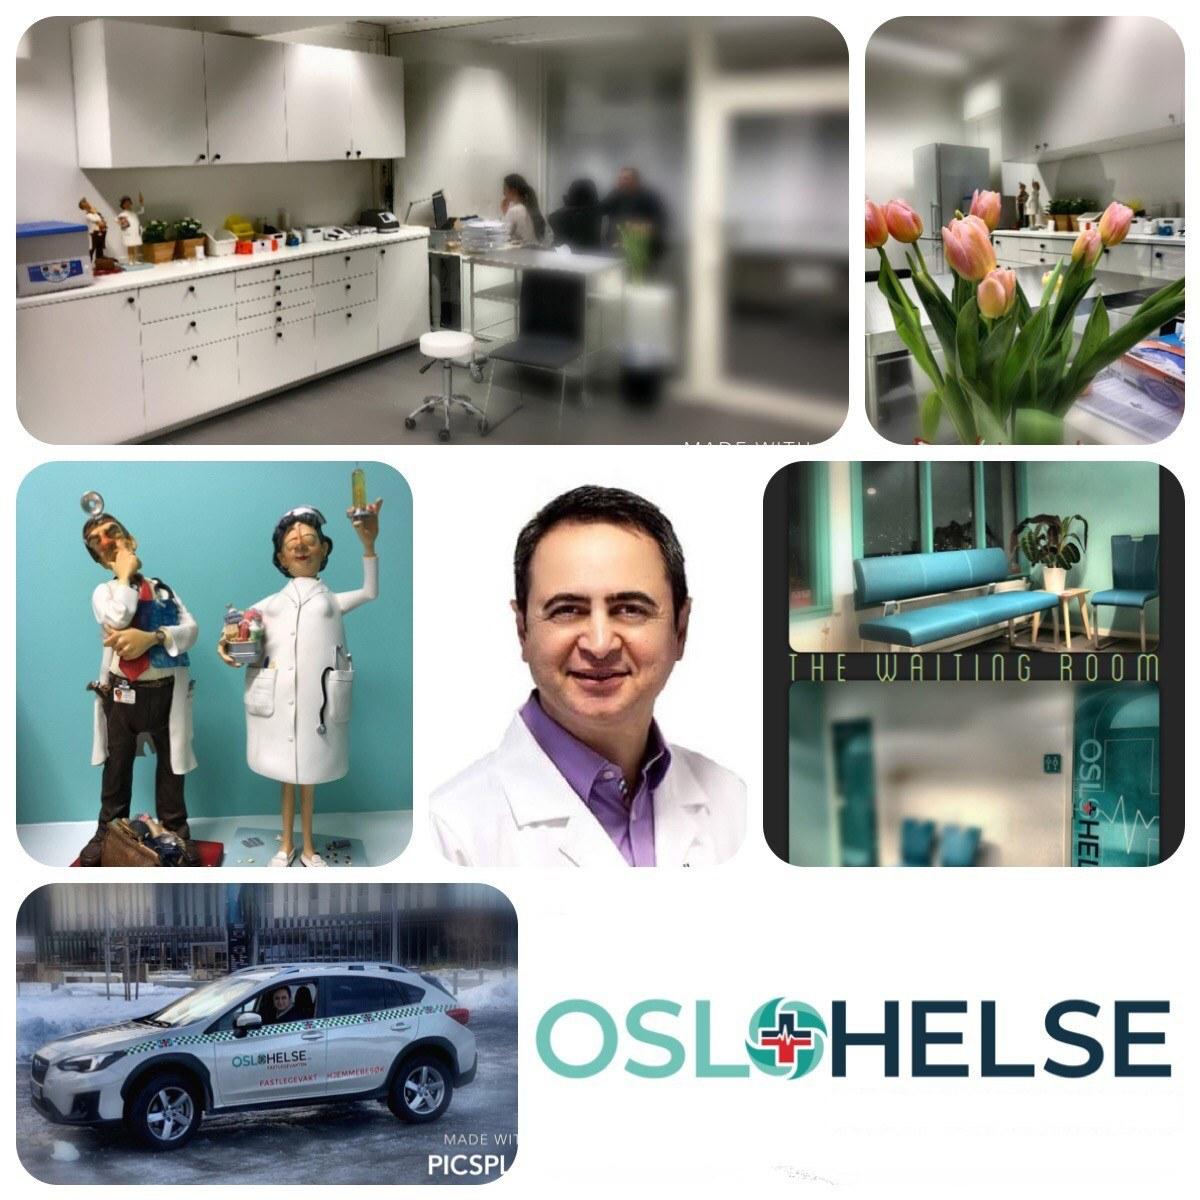 Oslo Helse clinic